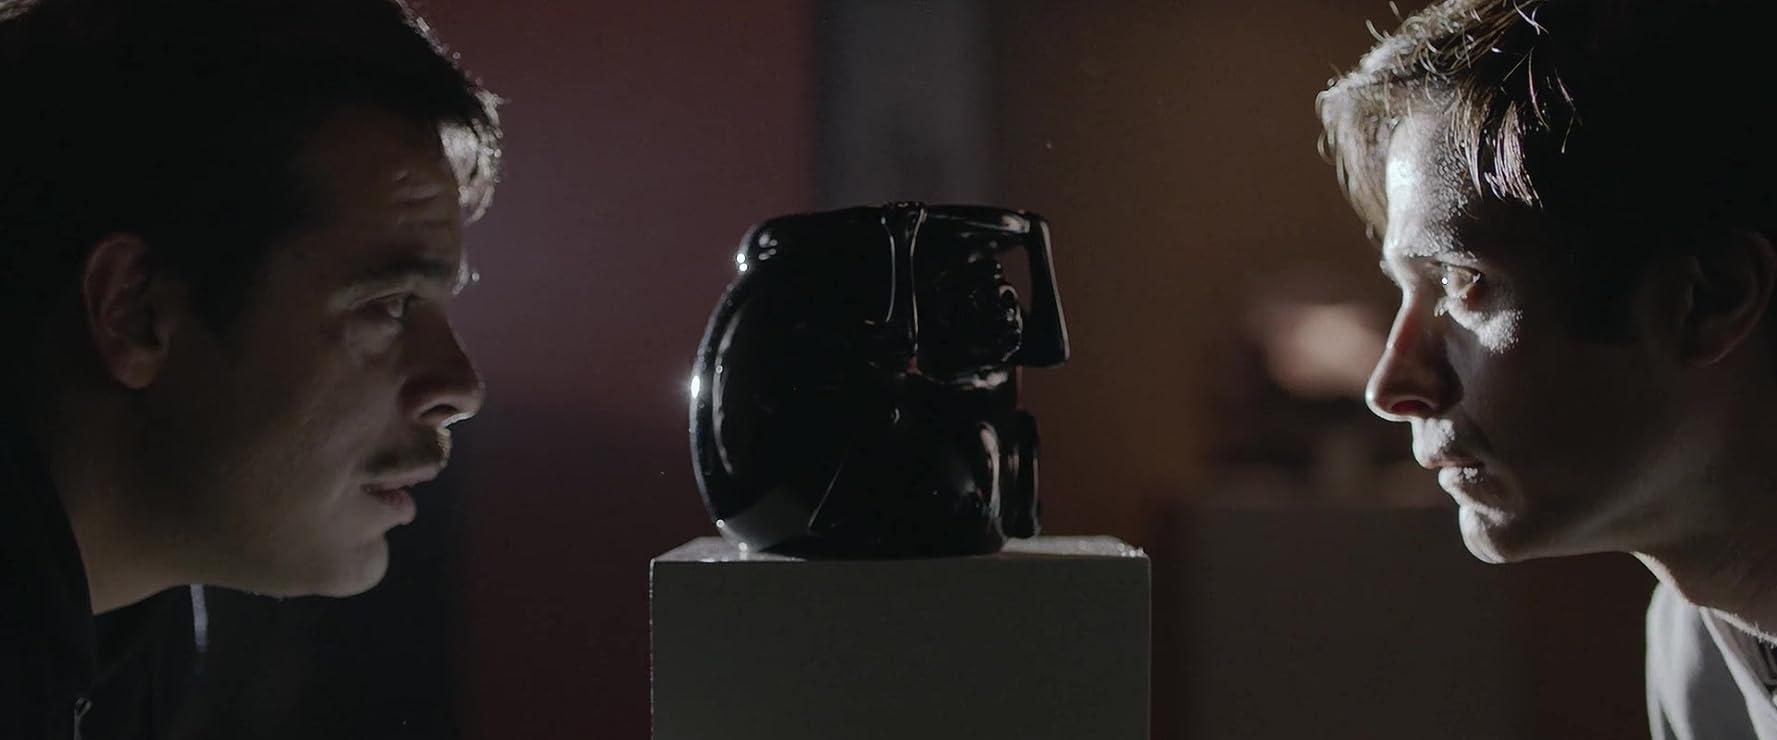 Museo (2018) Online Subtitrat in Romana in HD 1080p